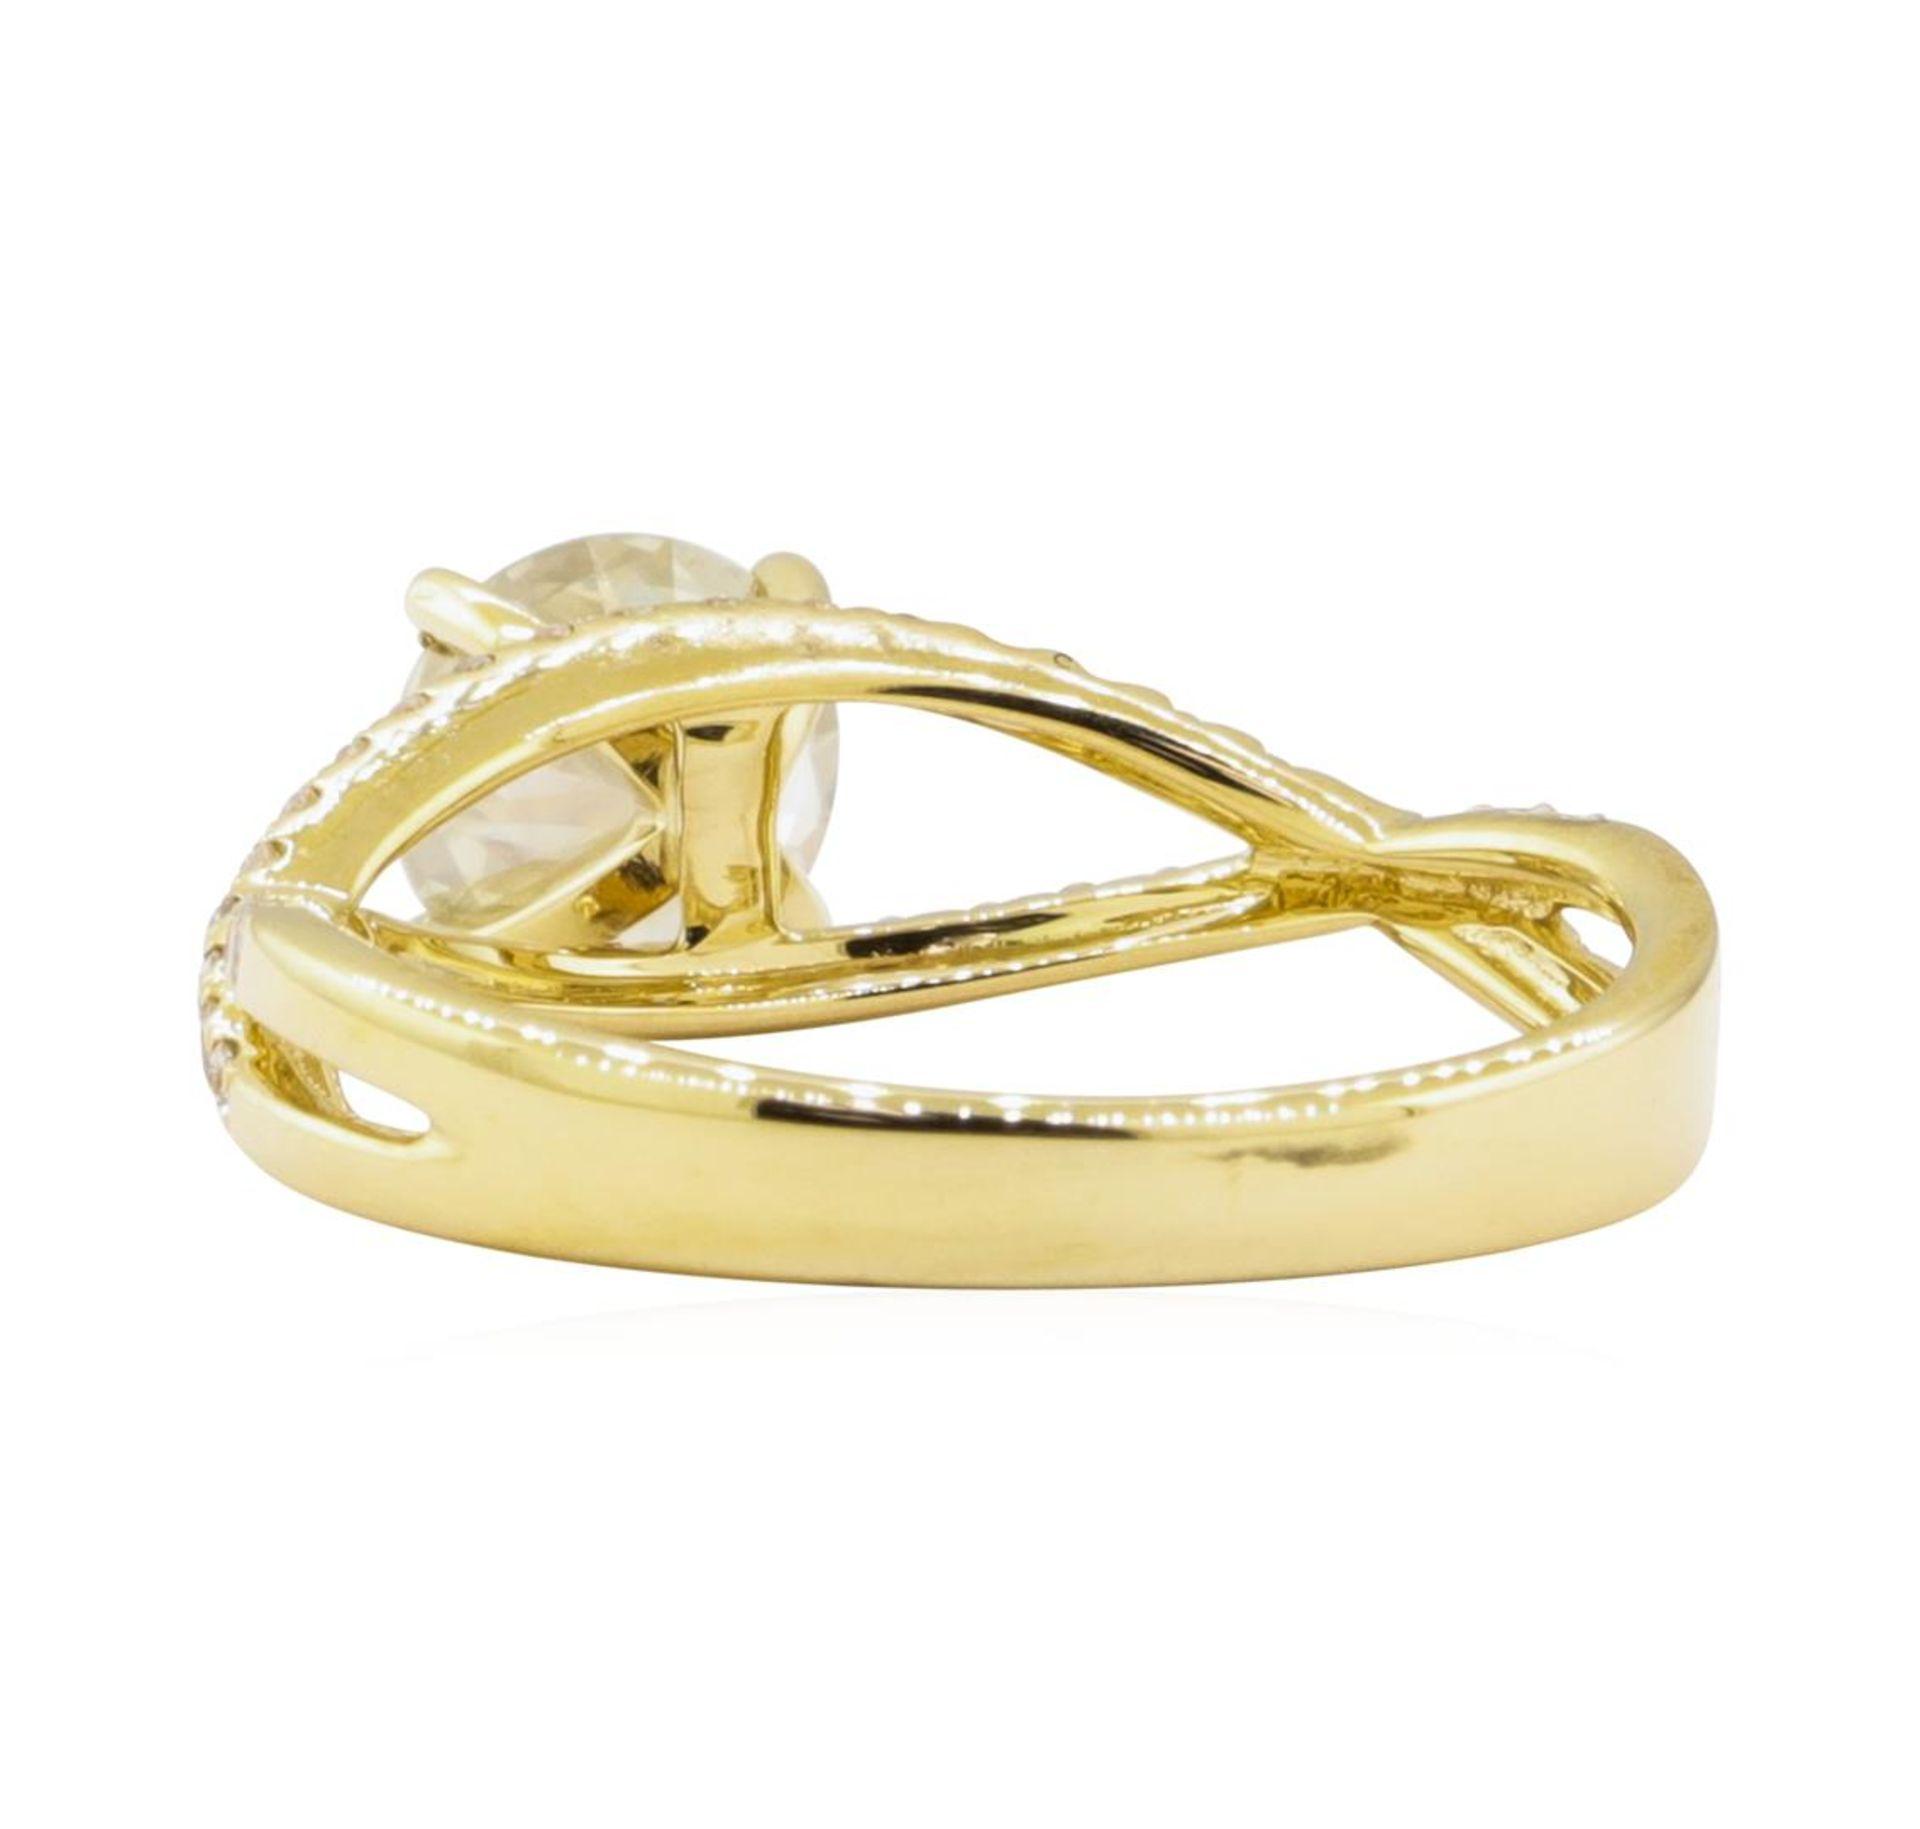 1.04ct Diamond Ring - 18KT Yellow Gold - Image 3 of 5